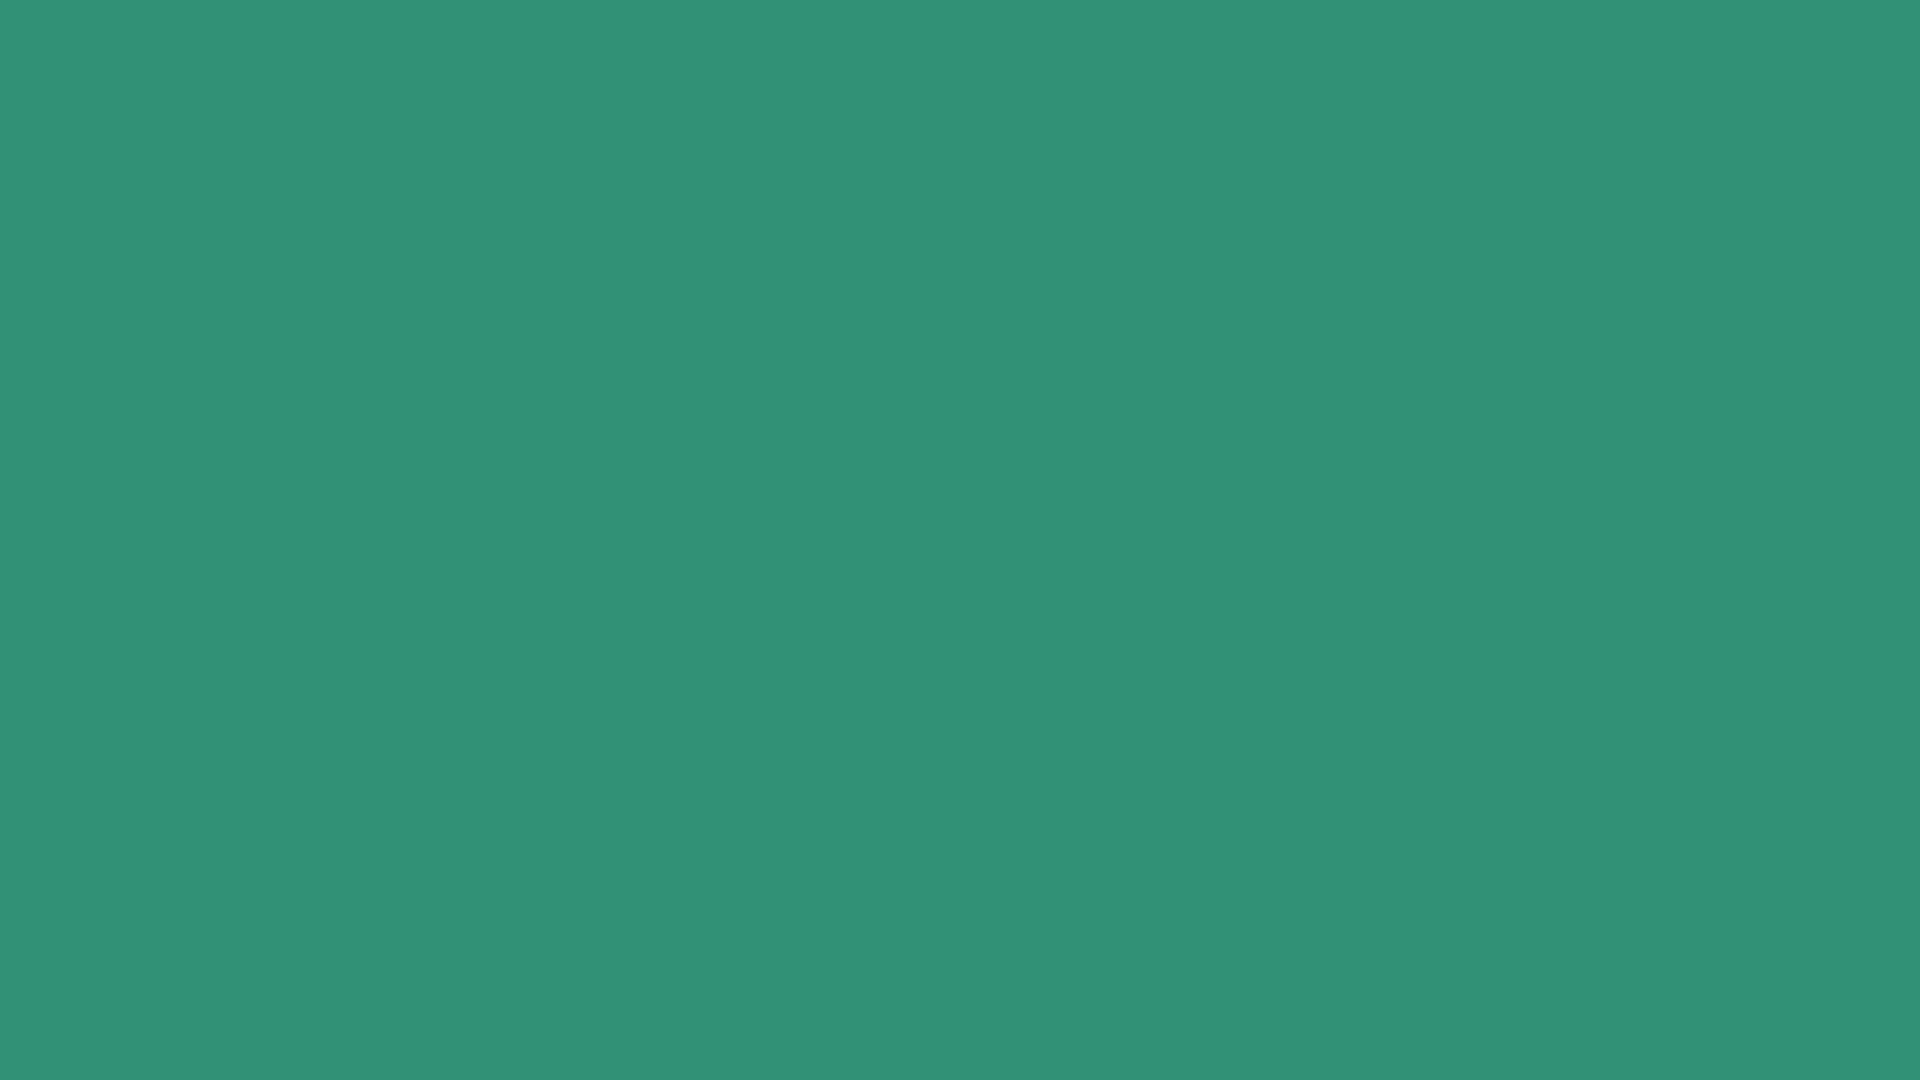 1920x1080 Illuminating Emerald Solid Color Background 1920x1080